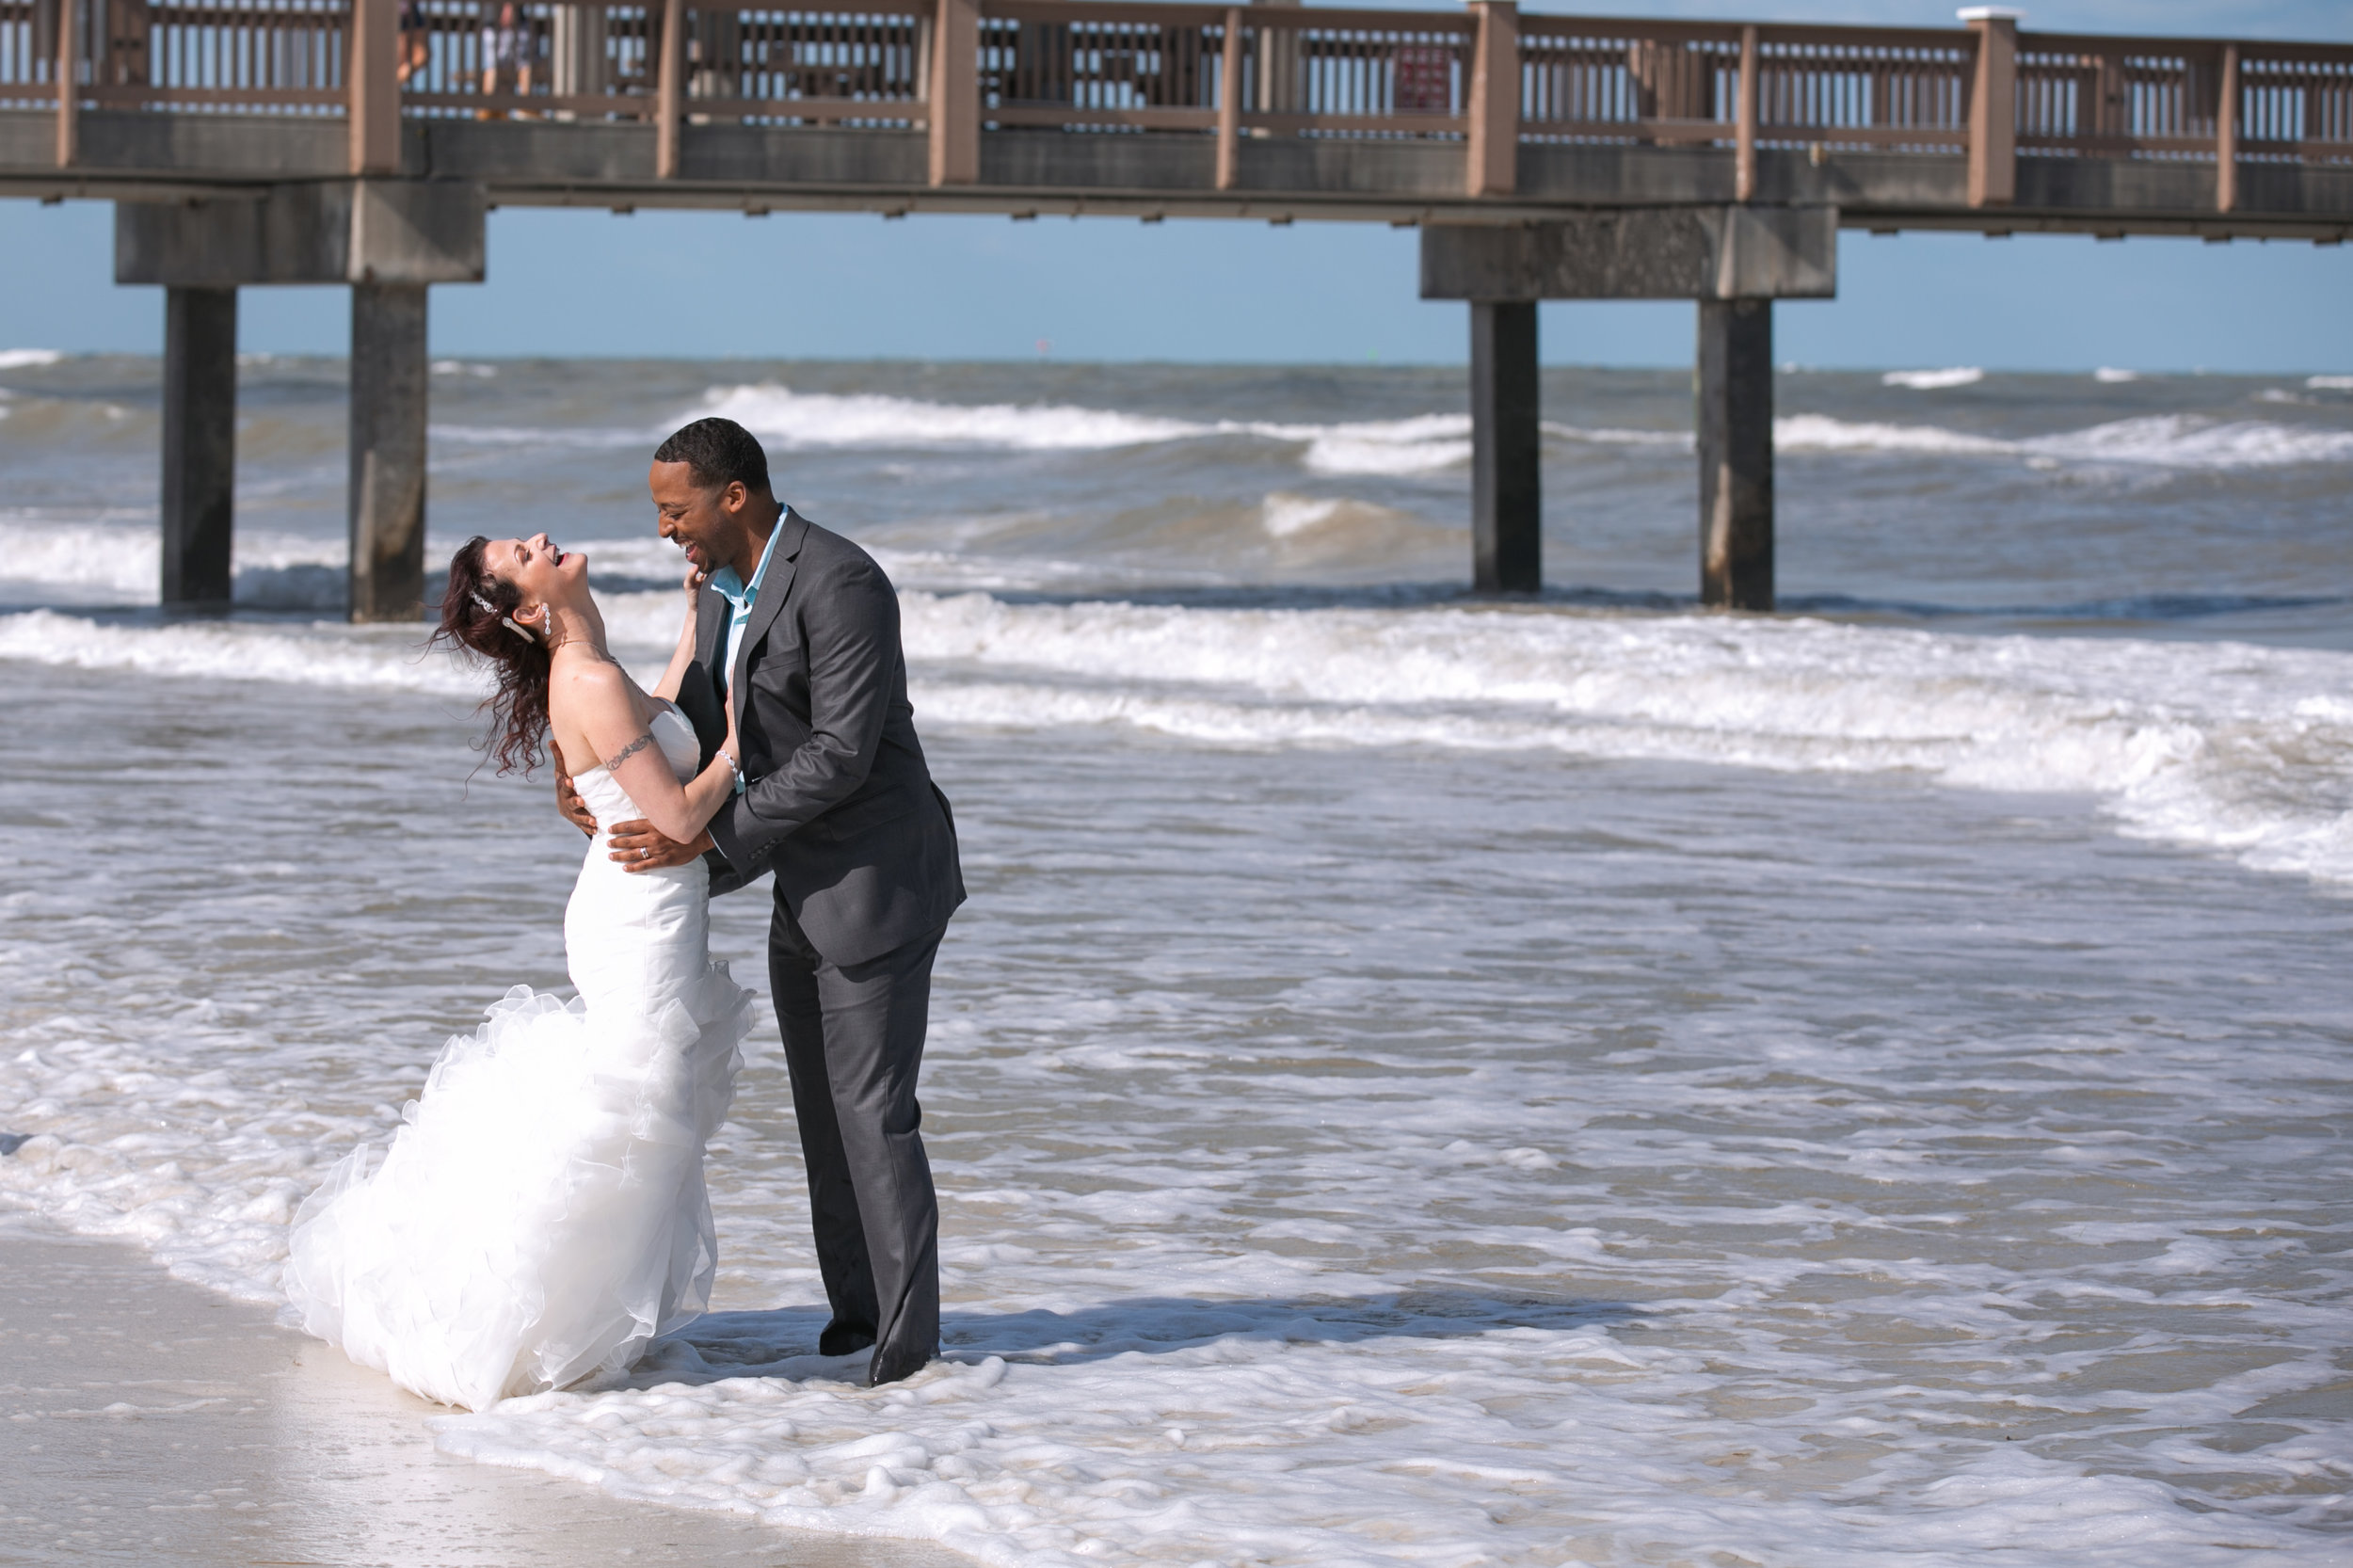 5_6_17 Amber and Chris Hyatt Clearwater Beach 01.jpg